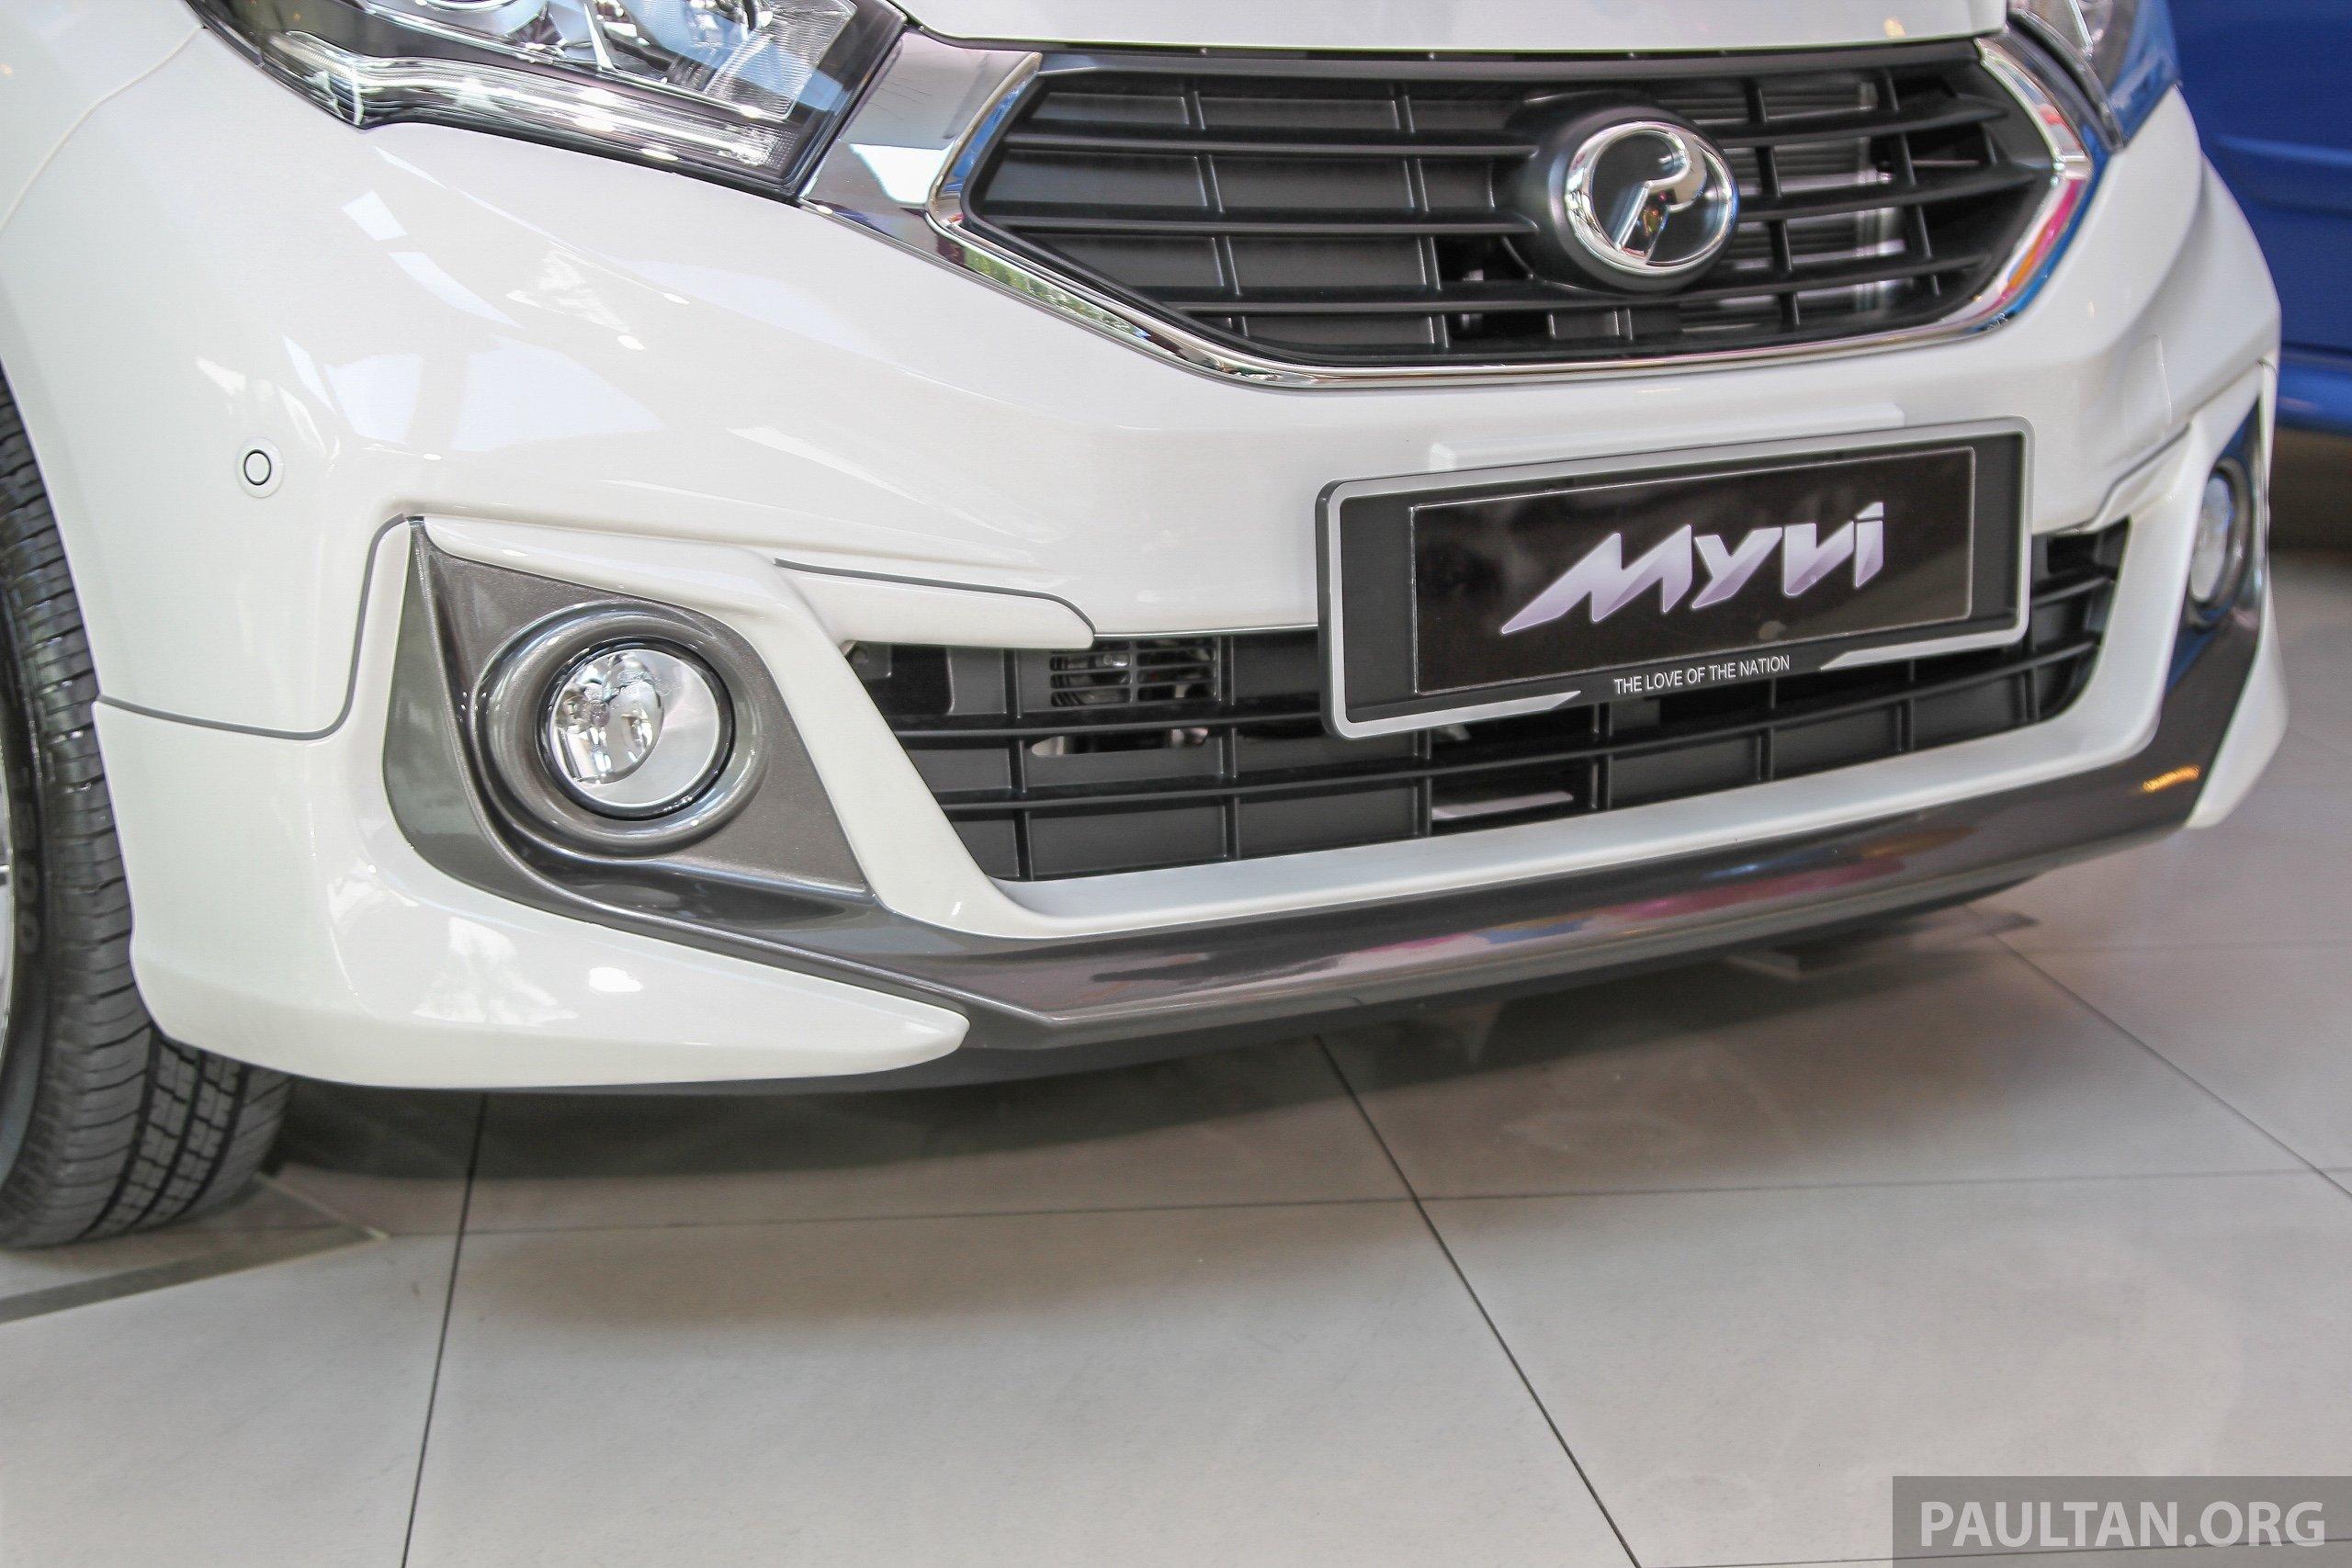 2018 Perodua Alza >> Perodua launches Alza S, Myvi Premium XS 1.3 today Paul Tan - Image 381525